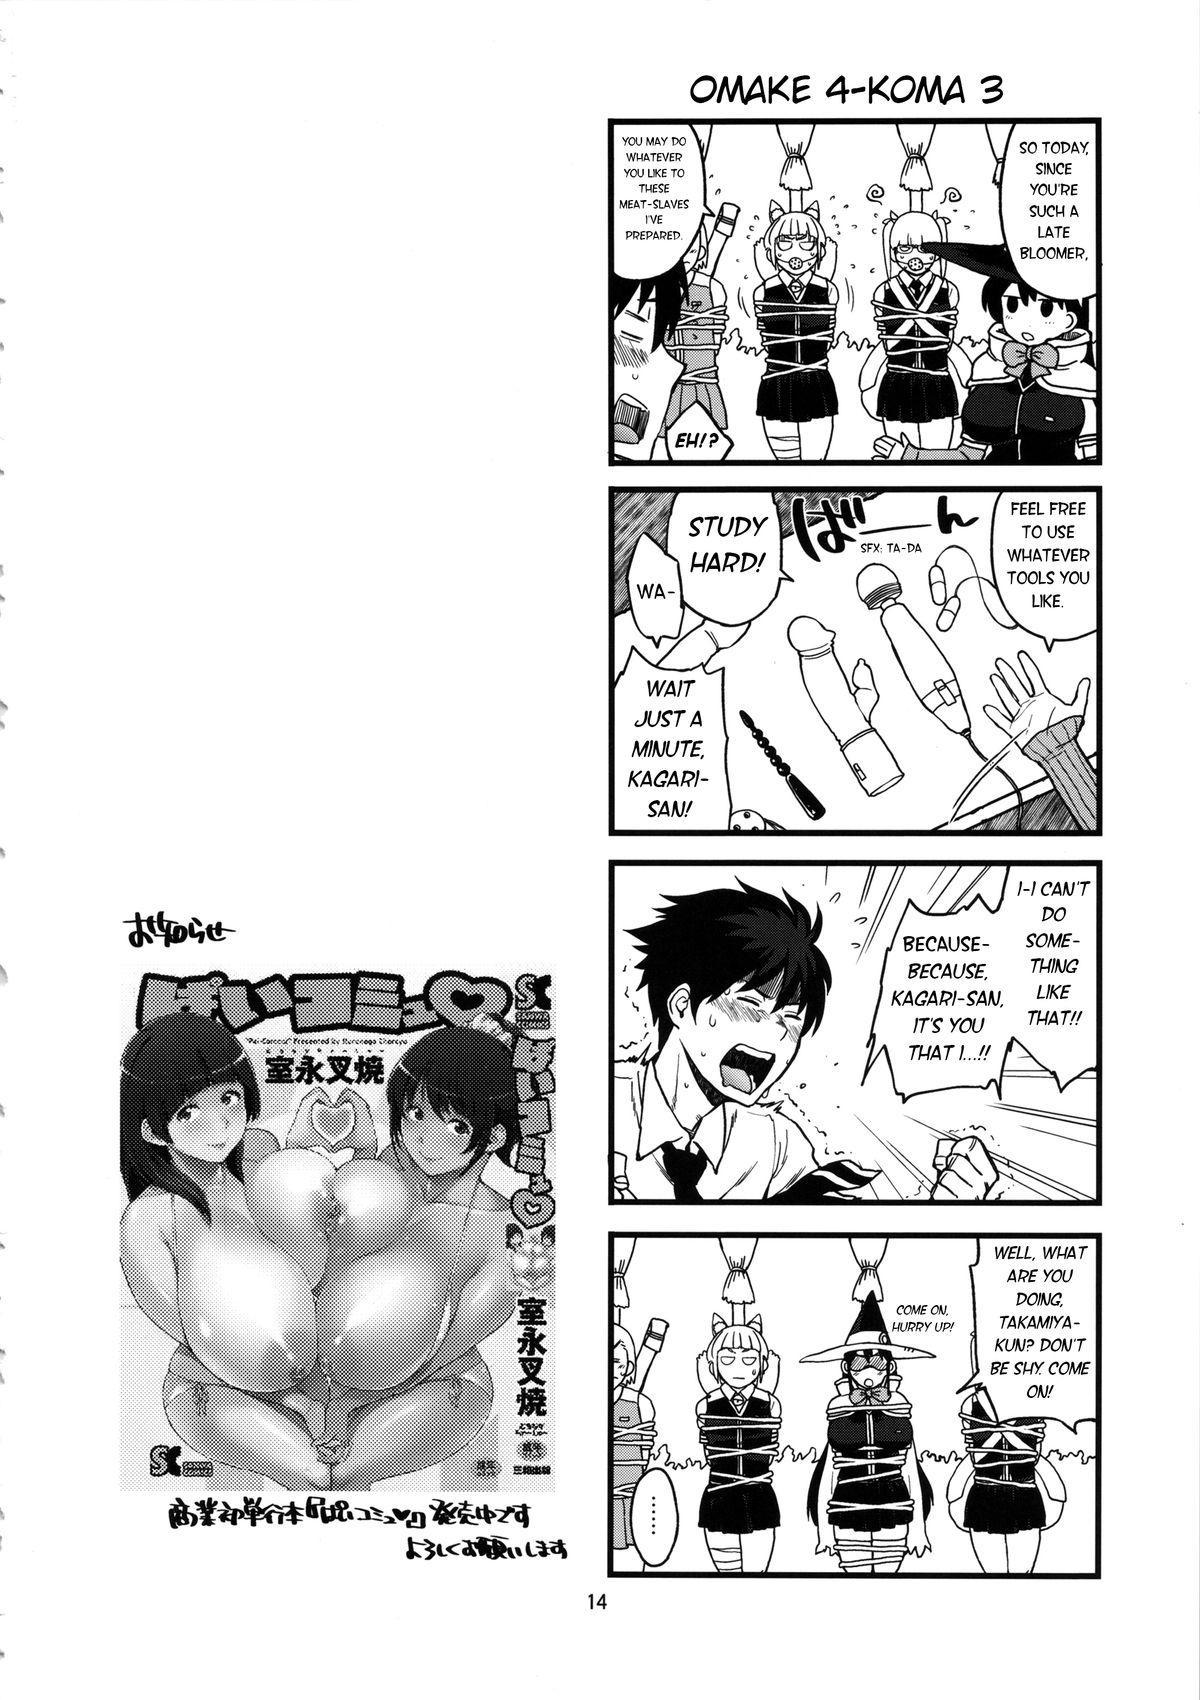 (COMIC1☆8) [Hybrid Jimushitsu (Muronaga Chaashuu) Hybrid Tsuushin Vol. 17 Witch Craft Boobs (Witch Craft Works) [English] 12